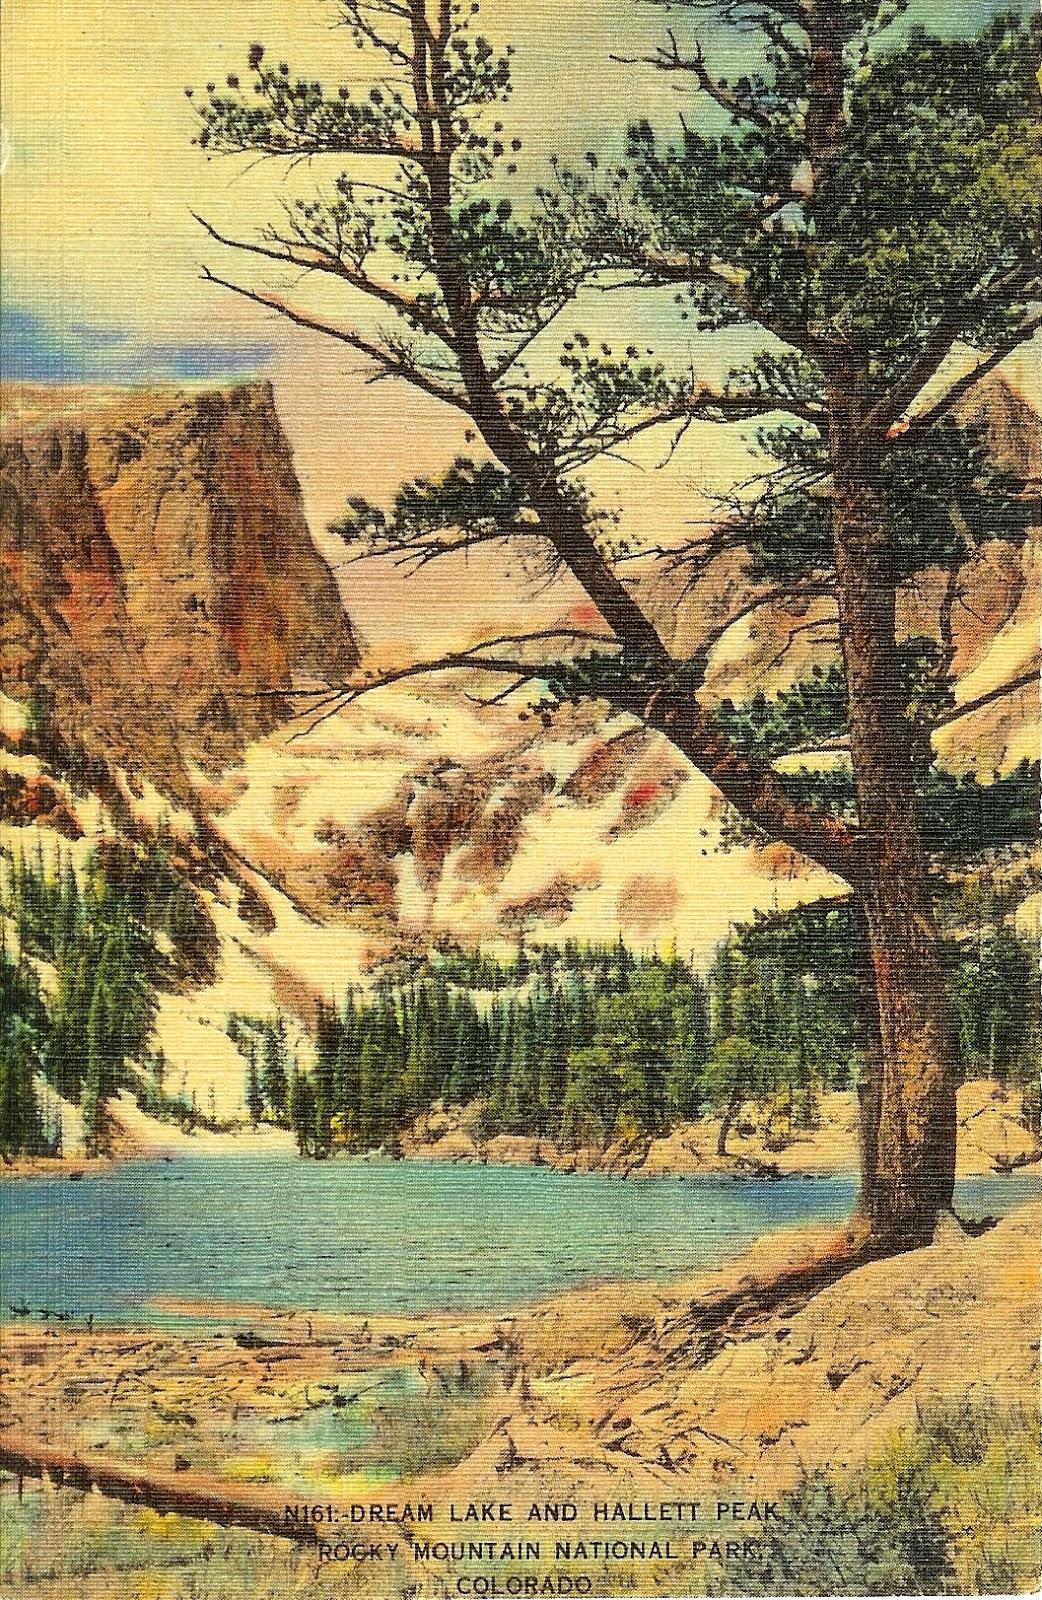 Writerquake Old Postcard Wednesday Dream Lake And